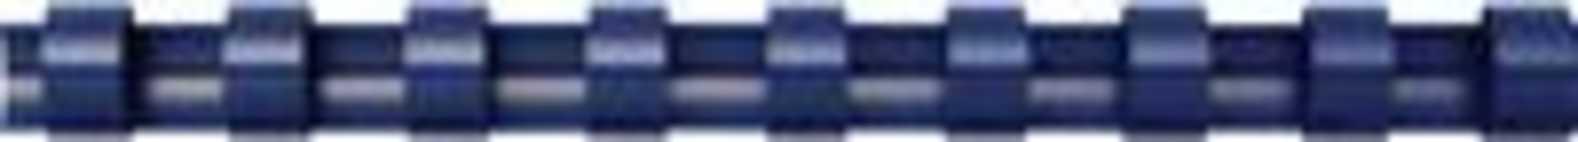 Fellowes bindruggen, pak van 100 stuks, 12 mm, blauw